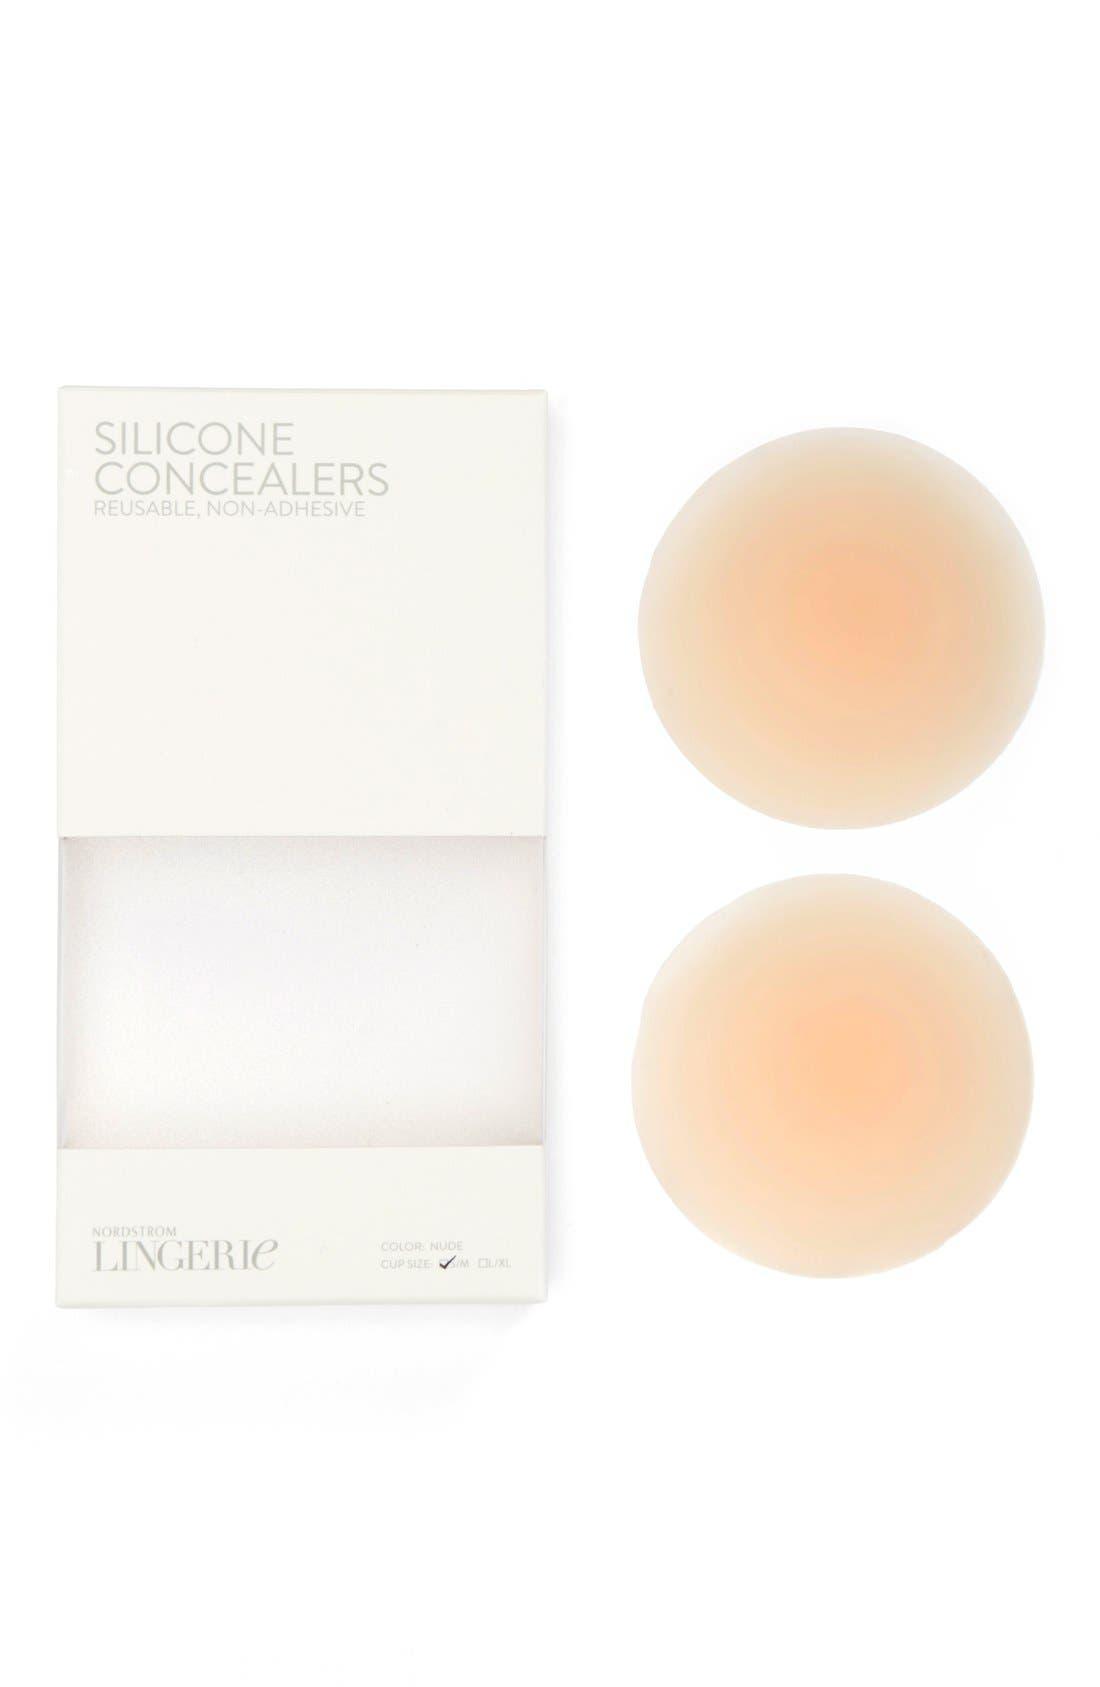 NORDSTROM LINGERIE Non-Adhesive Silicone Breast Petals